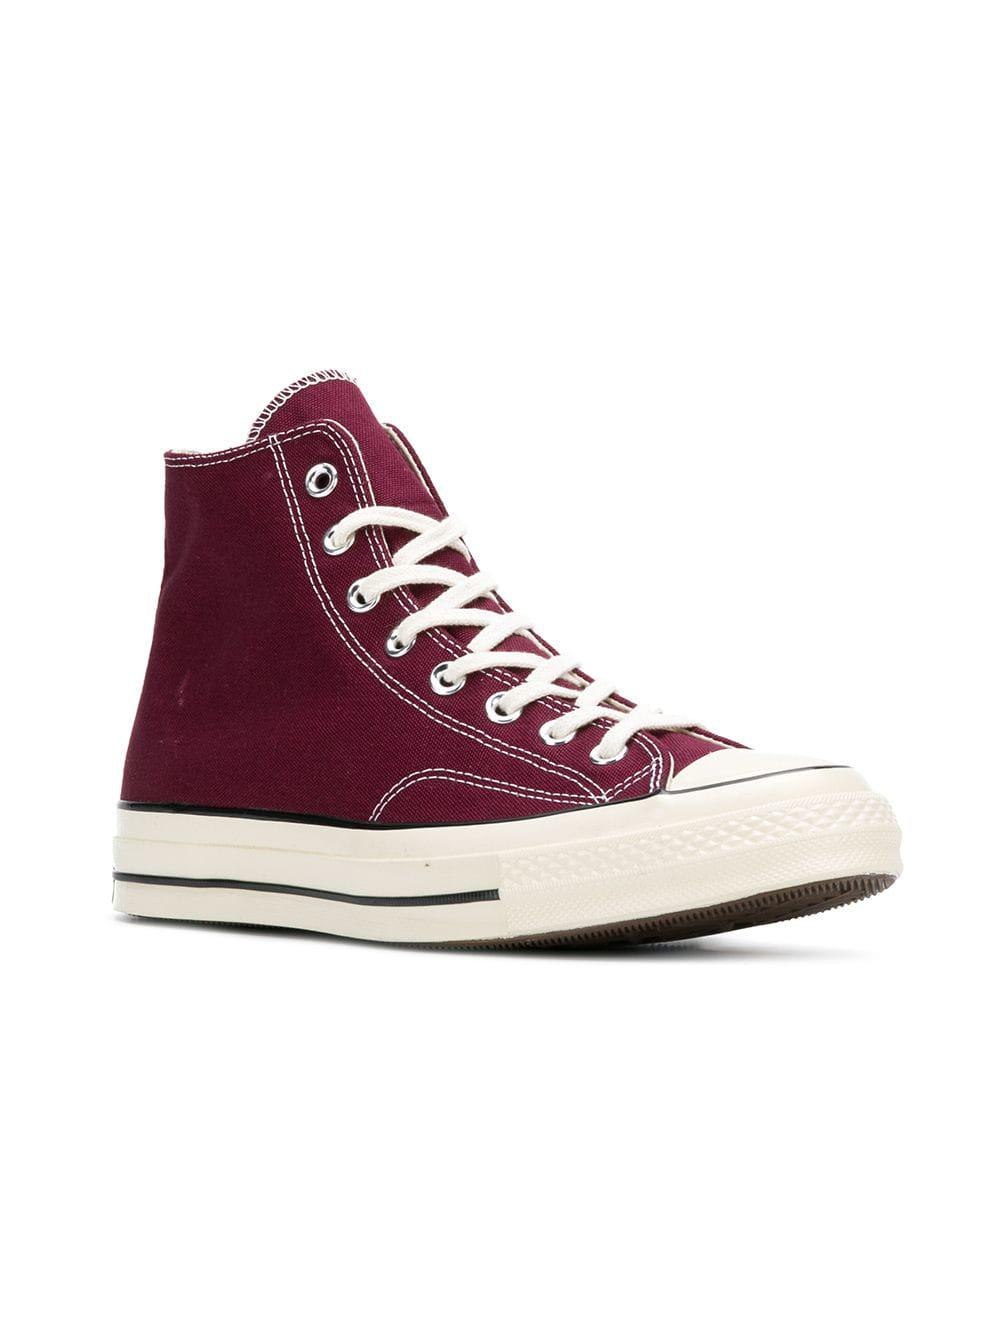 37cb4cb8f6a6 Converse Classic Hi-top Chuck 70 Sneakers in Red for Men - Lyst